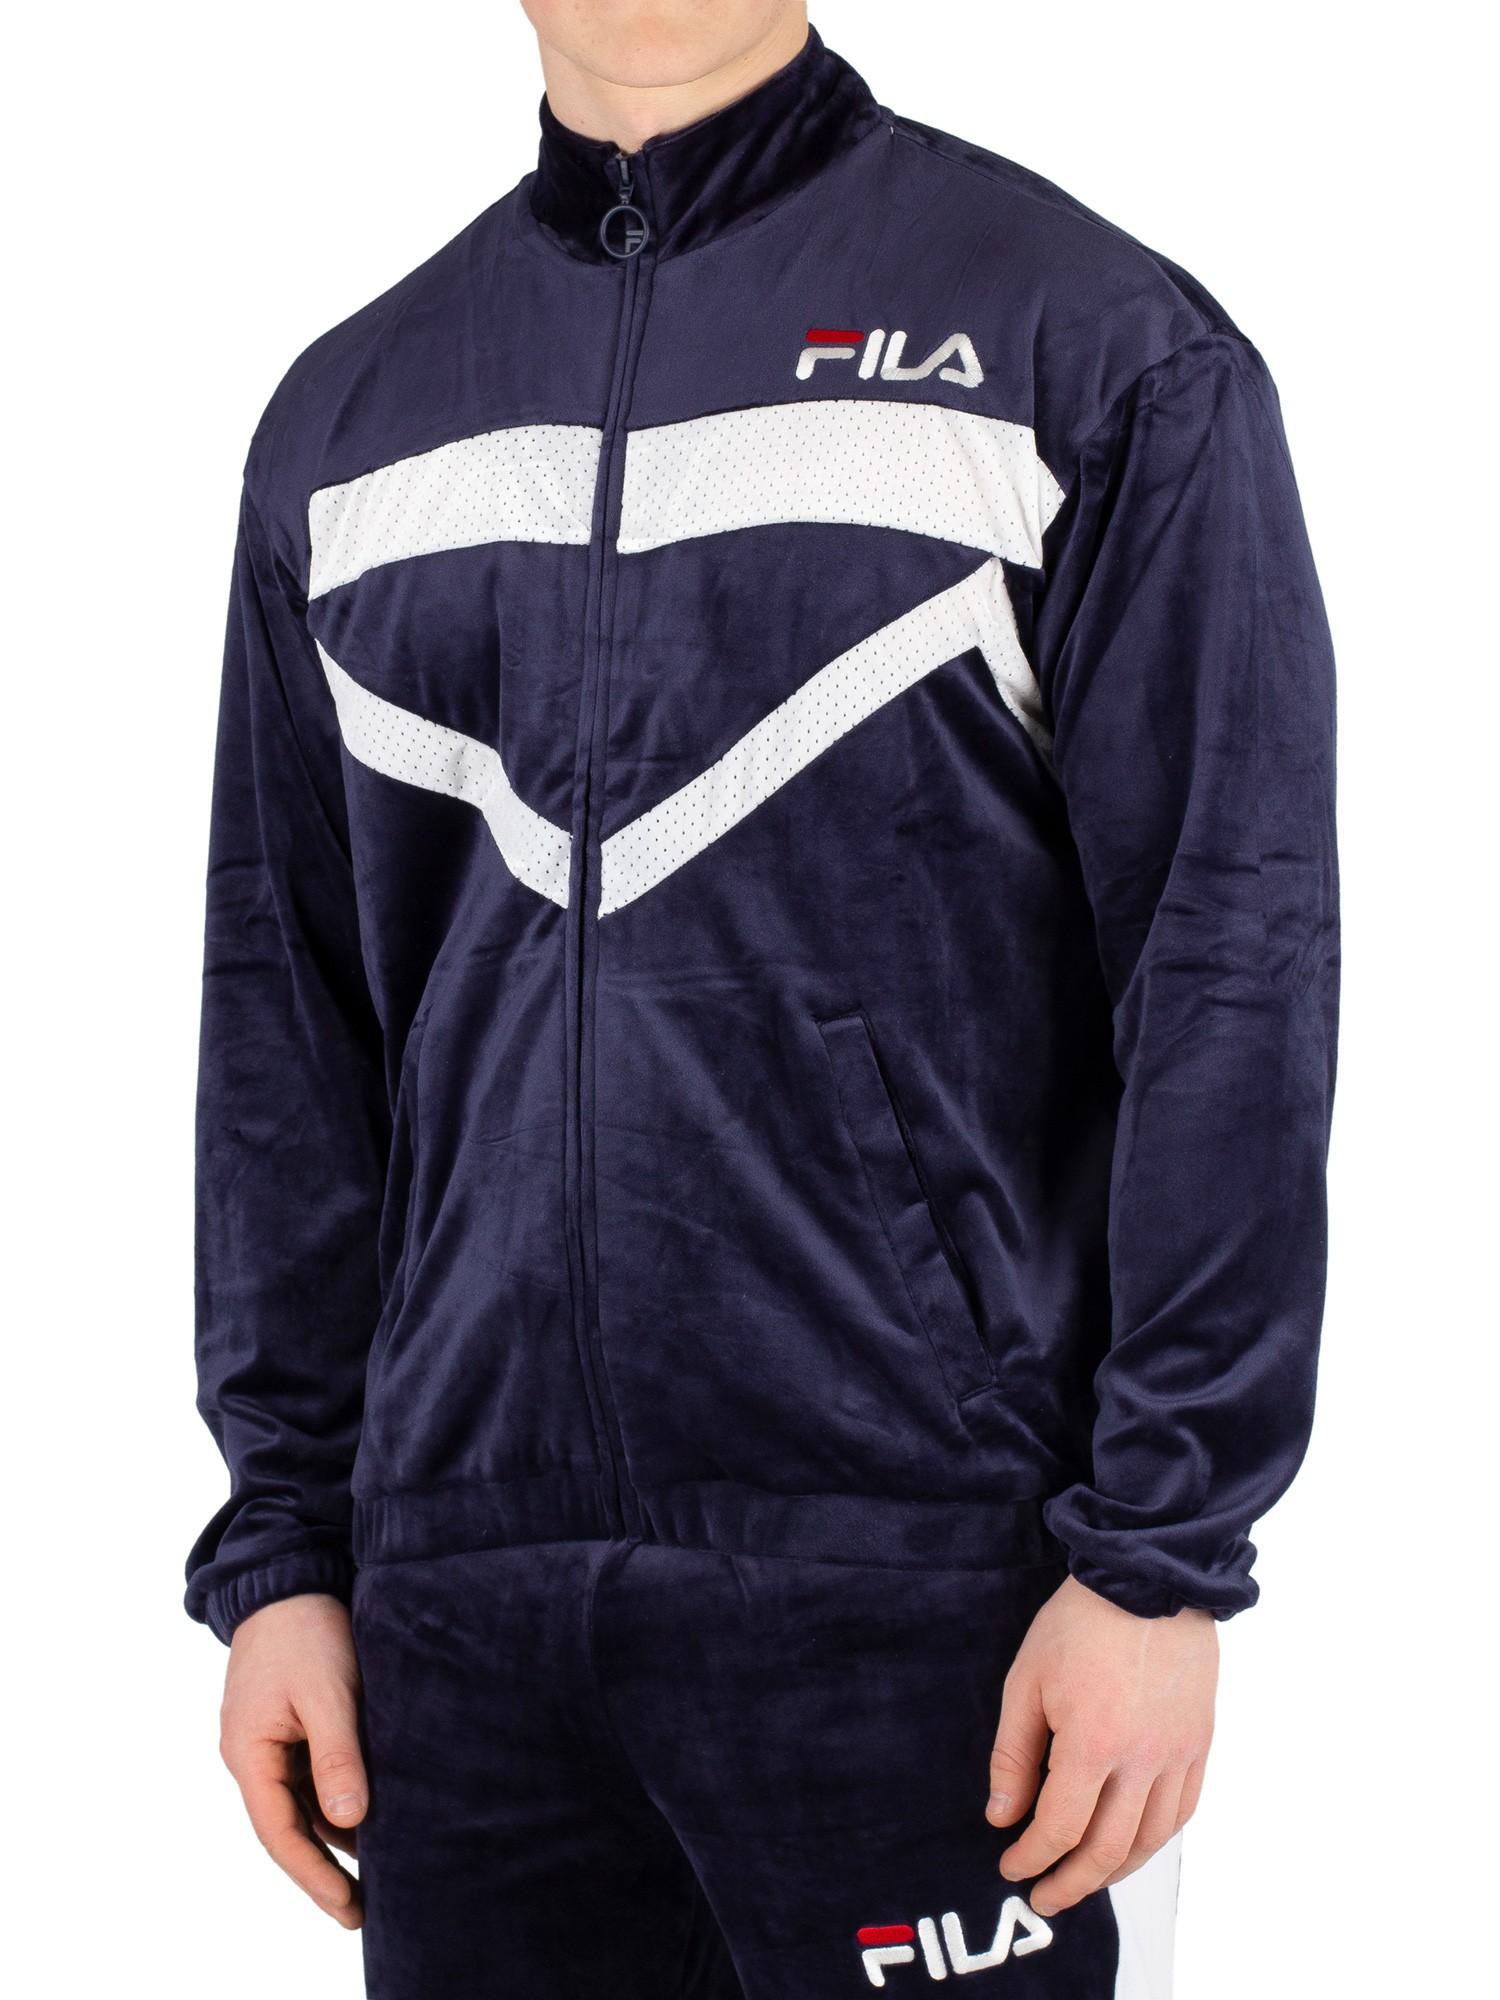 20ed7d09 Fila | Fila Vintage Menswear | Standout